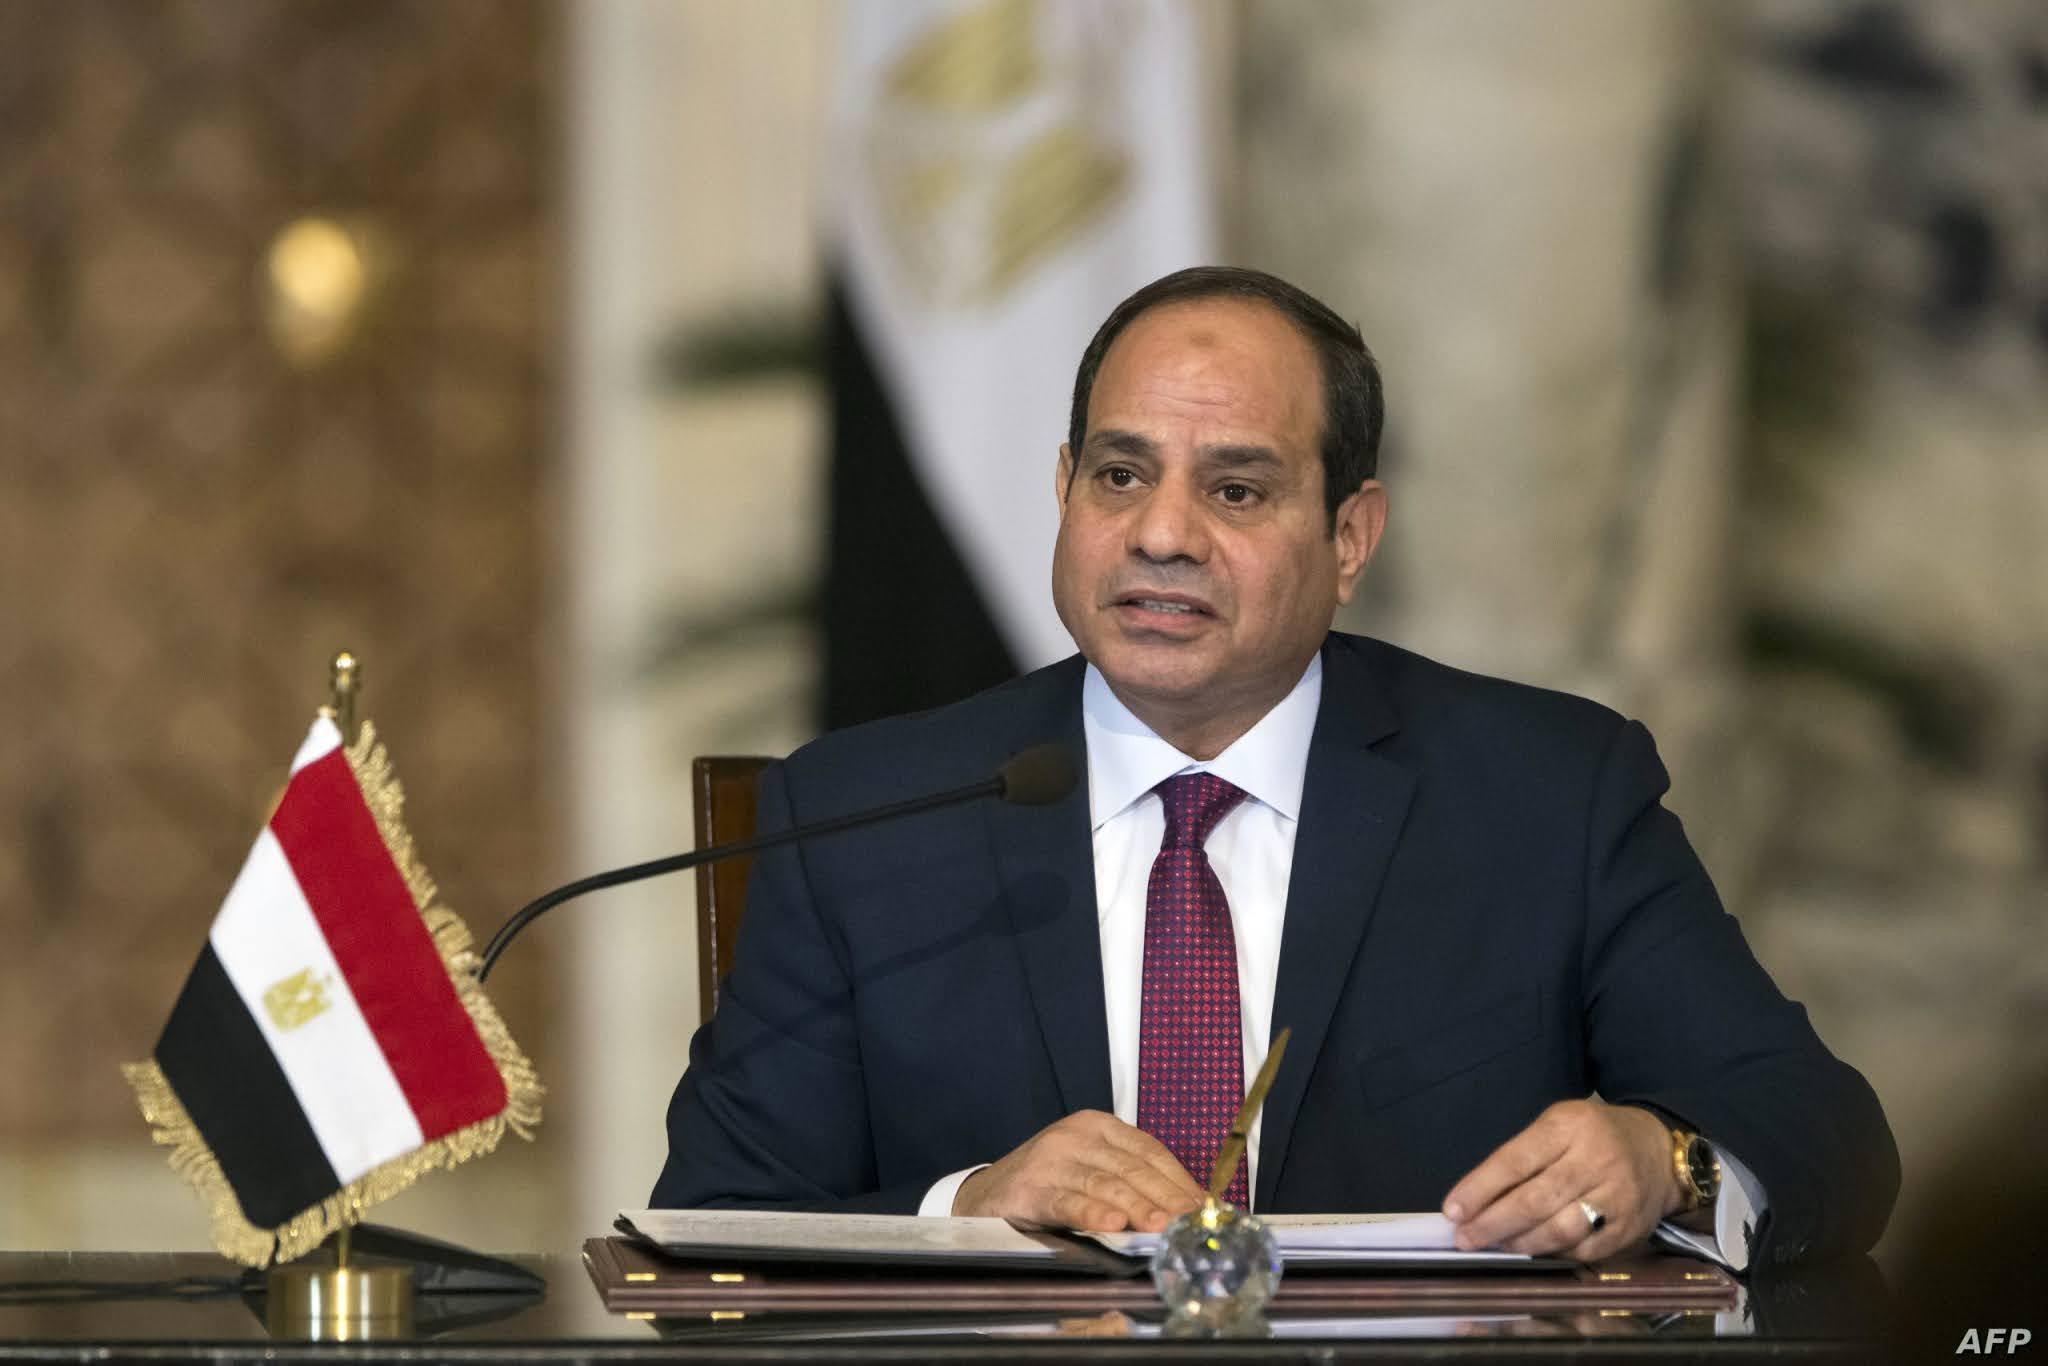 Egyptian President congratulates UAE on Hope Probe's success